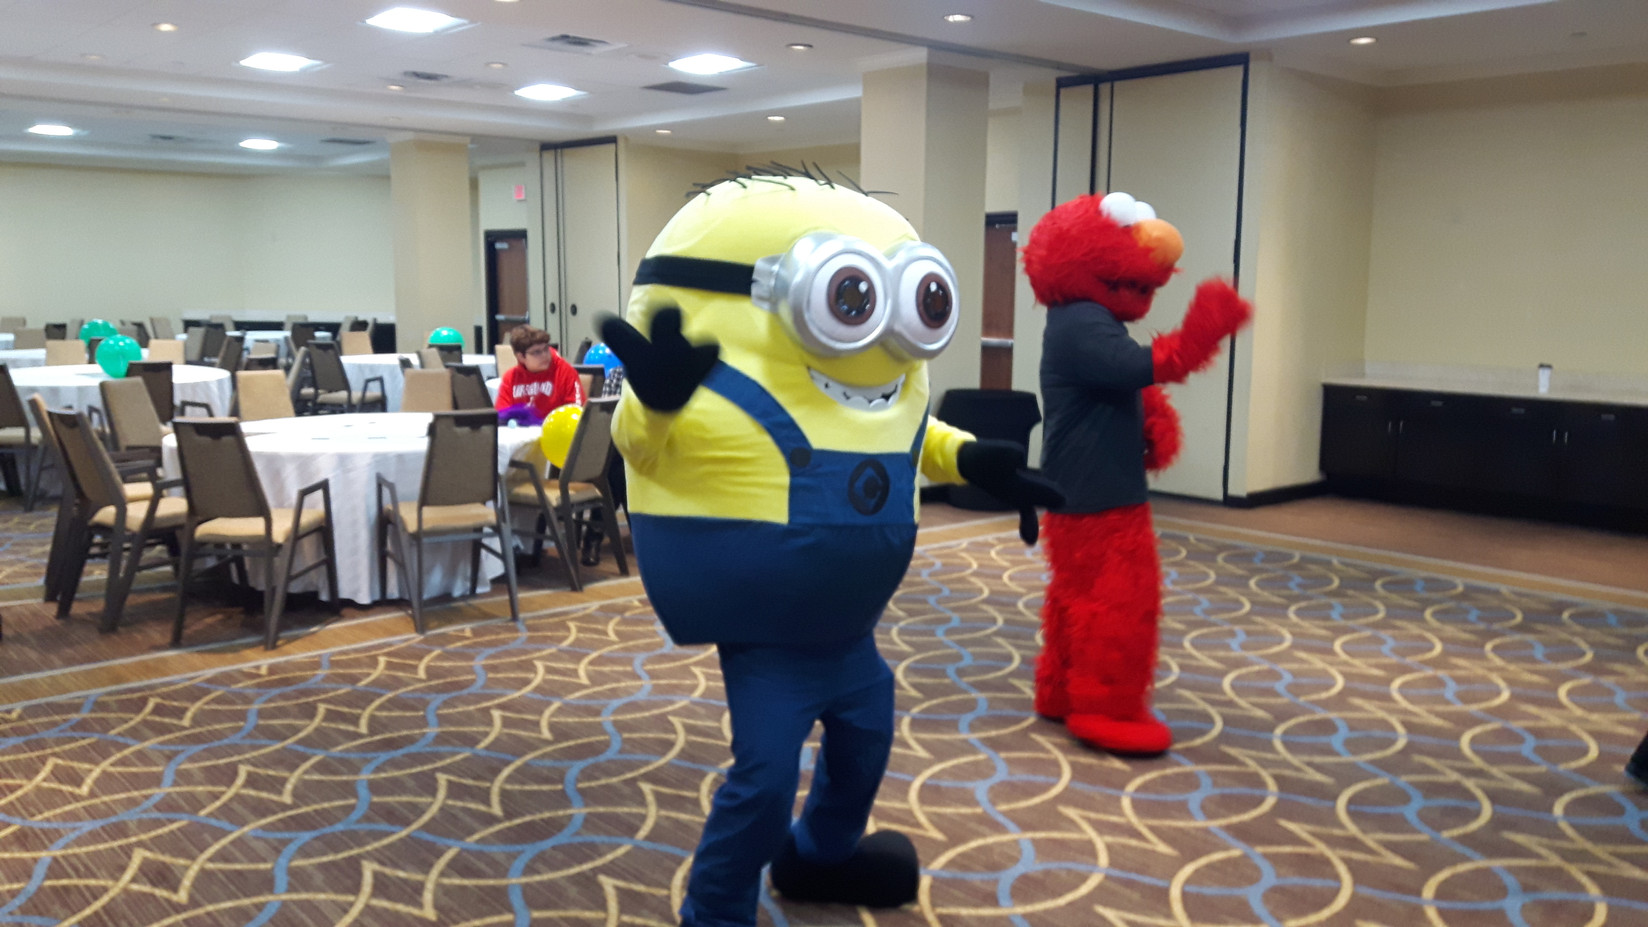 Dancing-Minion-Costume-Character.jpg